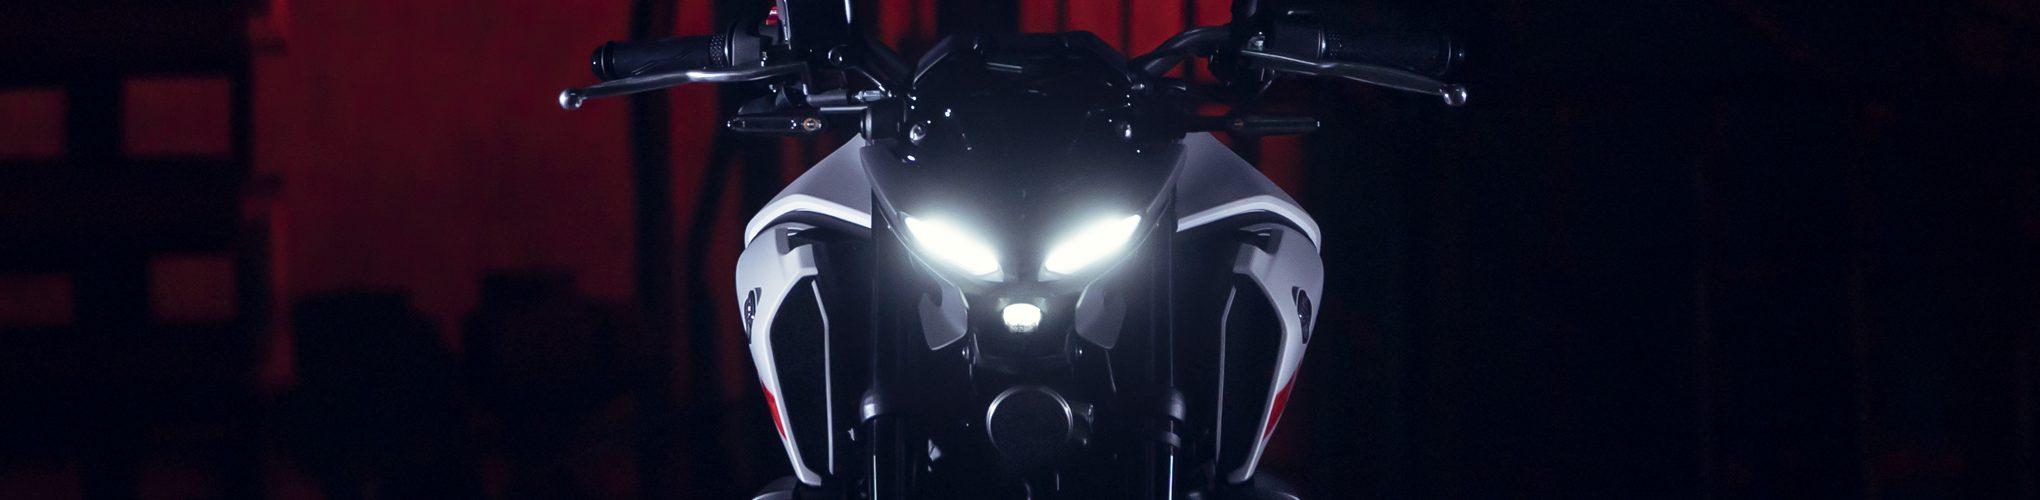 Yamaha MT-03 ABS | MotorCentrumWest